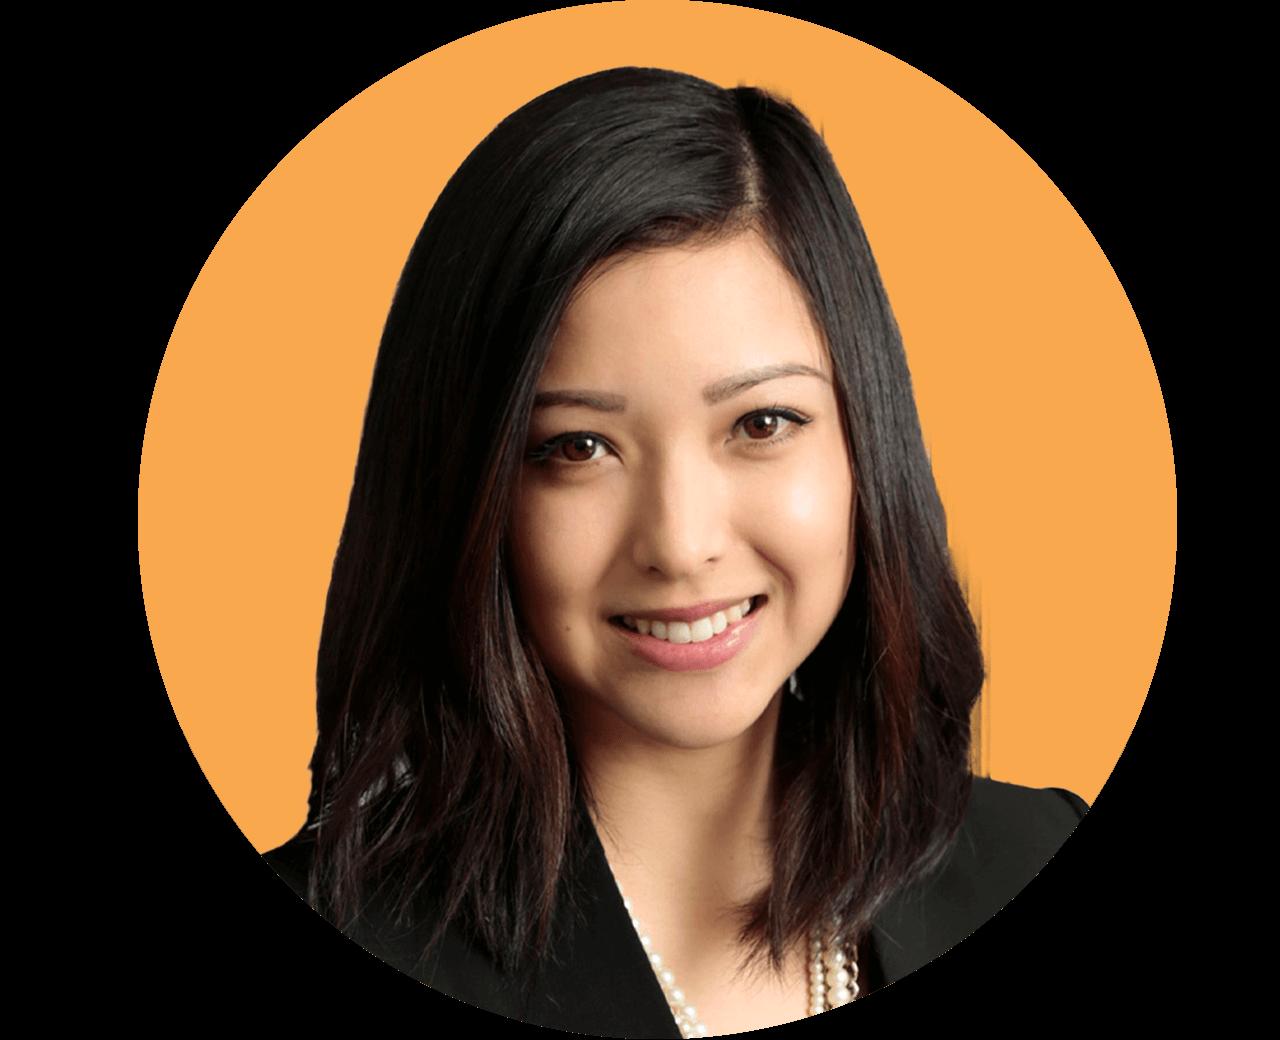 Brooke Nakatsukasa headshot